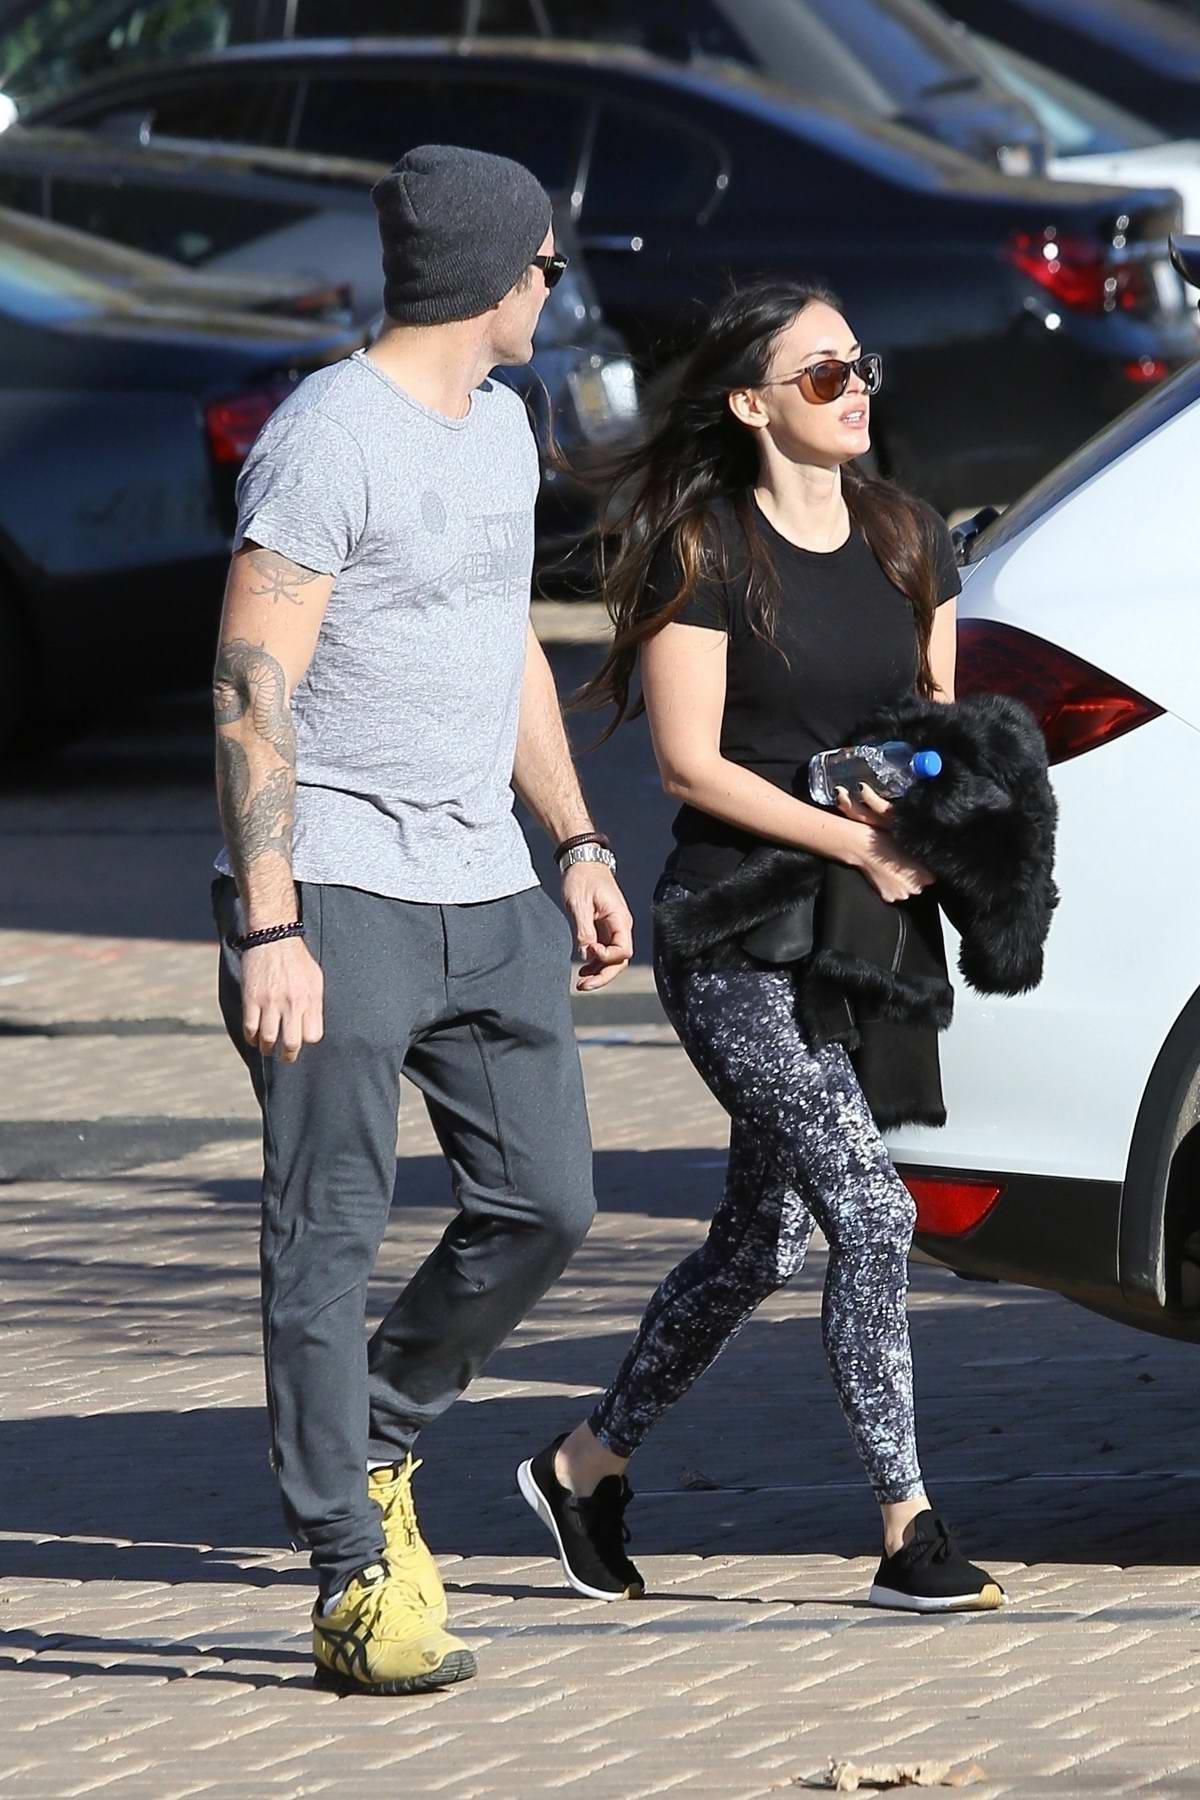 Megan Fox and Brian Austin Green walk back to their car after shopping at Malibu Country Mart, Malibu, California